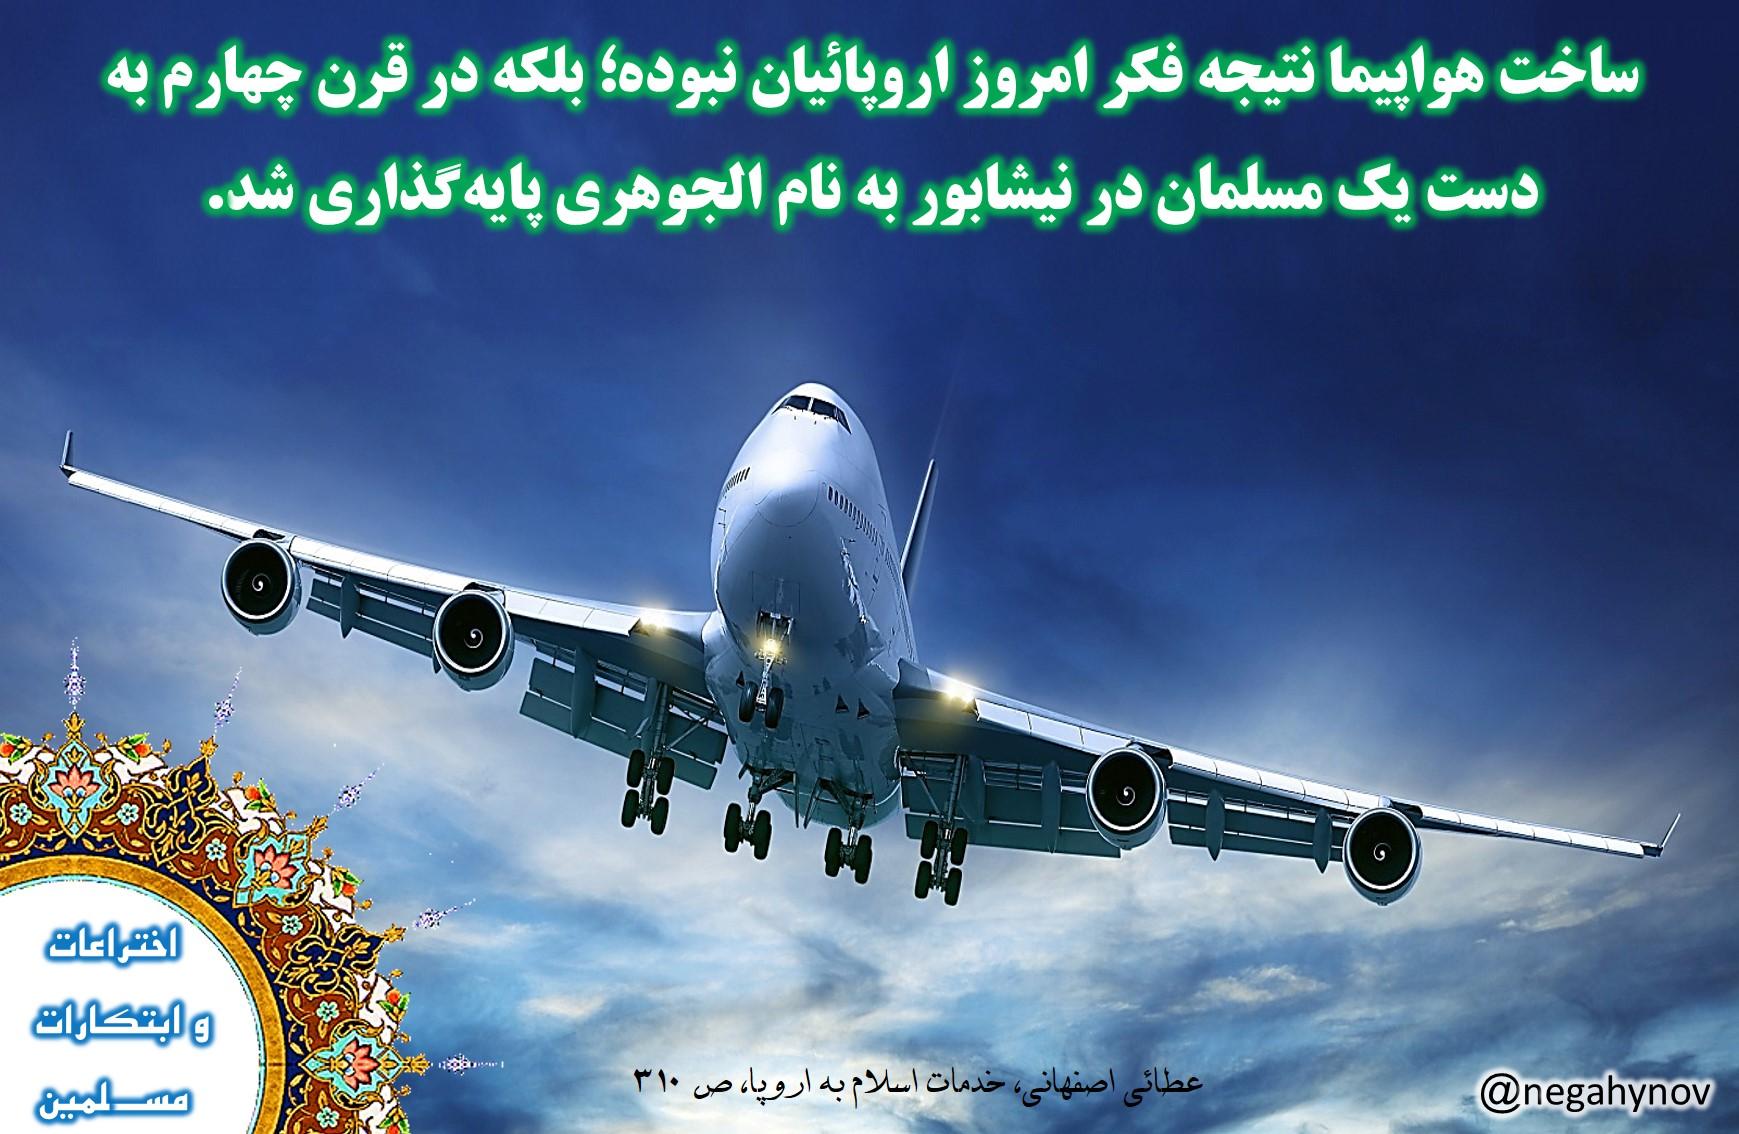 اسلام و گسترش علم - ابتکارات مسلمانان - مبانی ساخت هواپیما - نگاهی نو